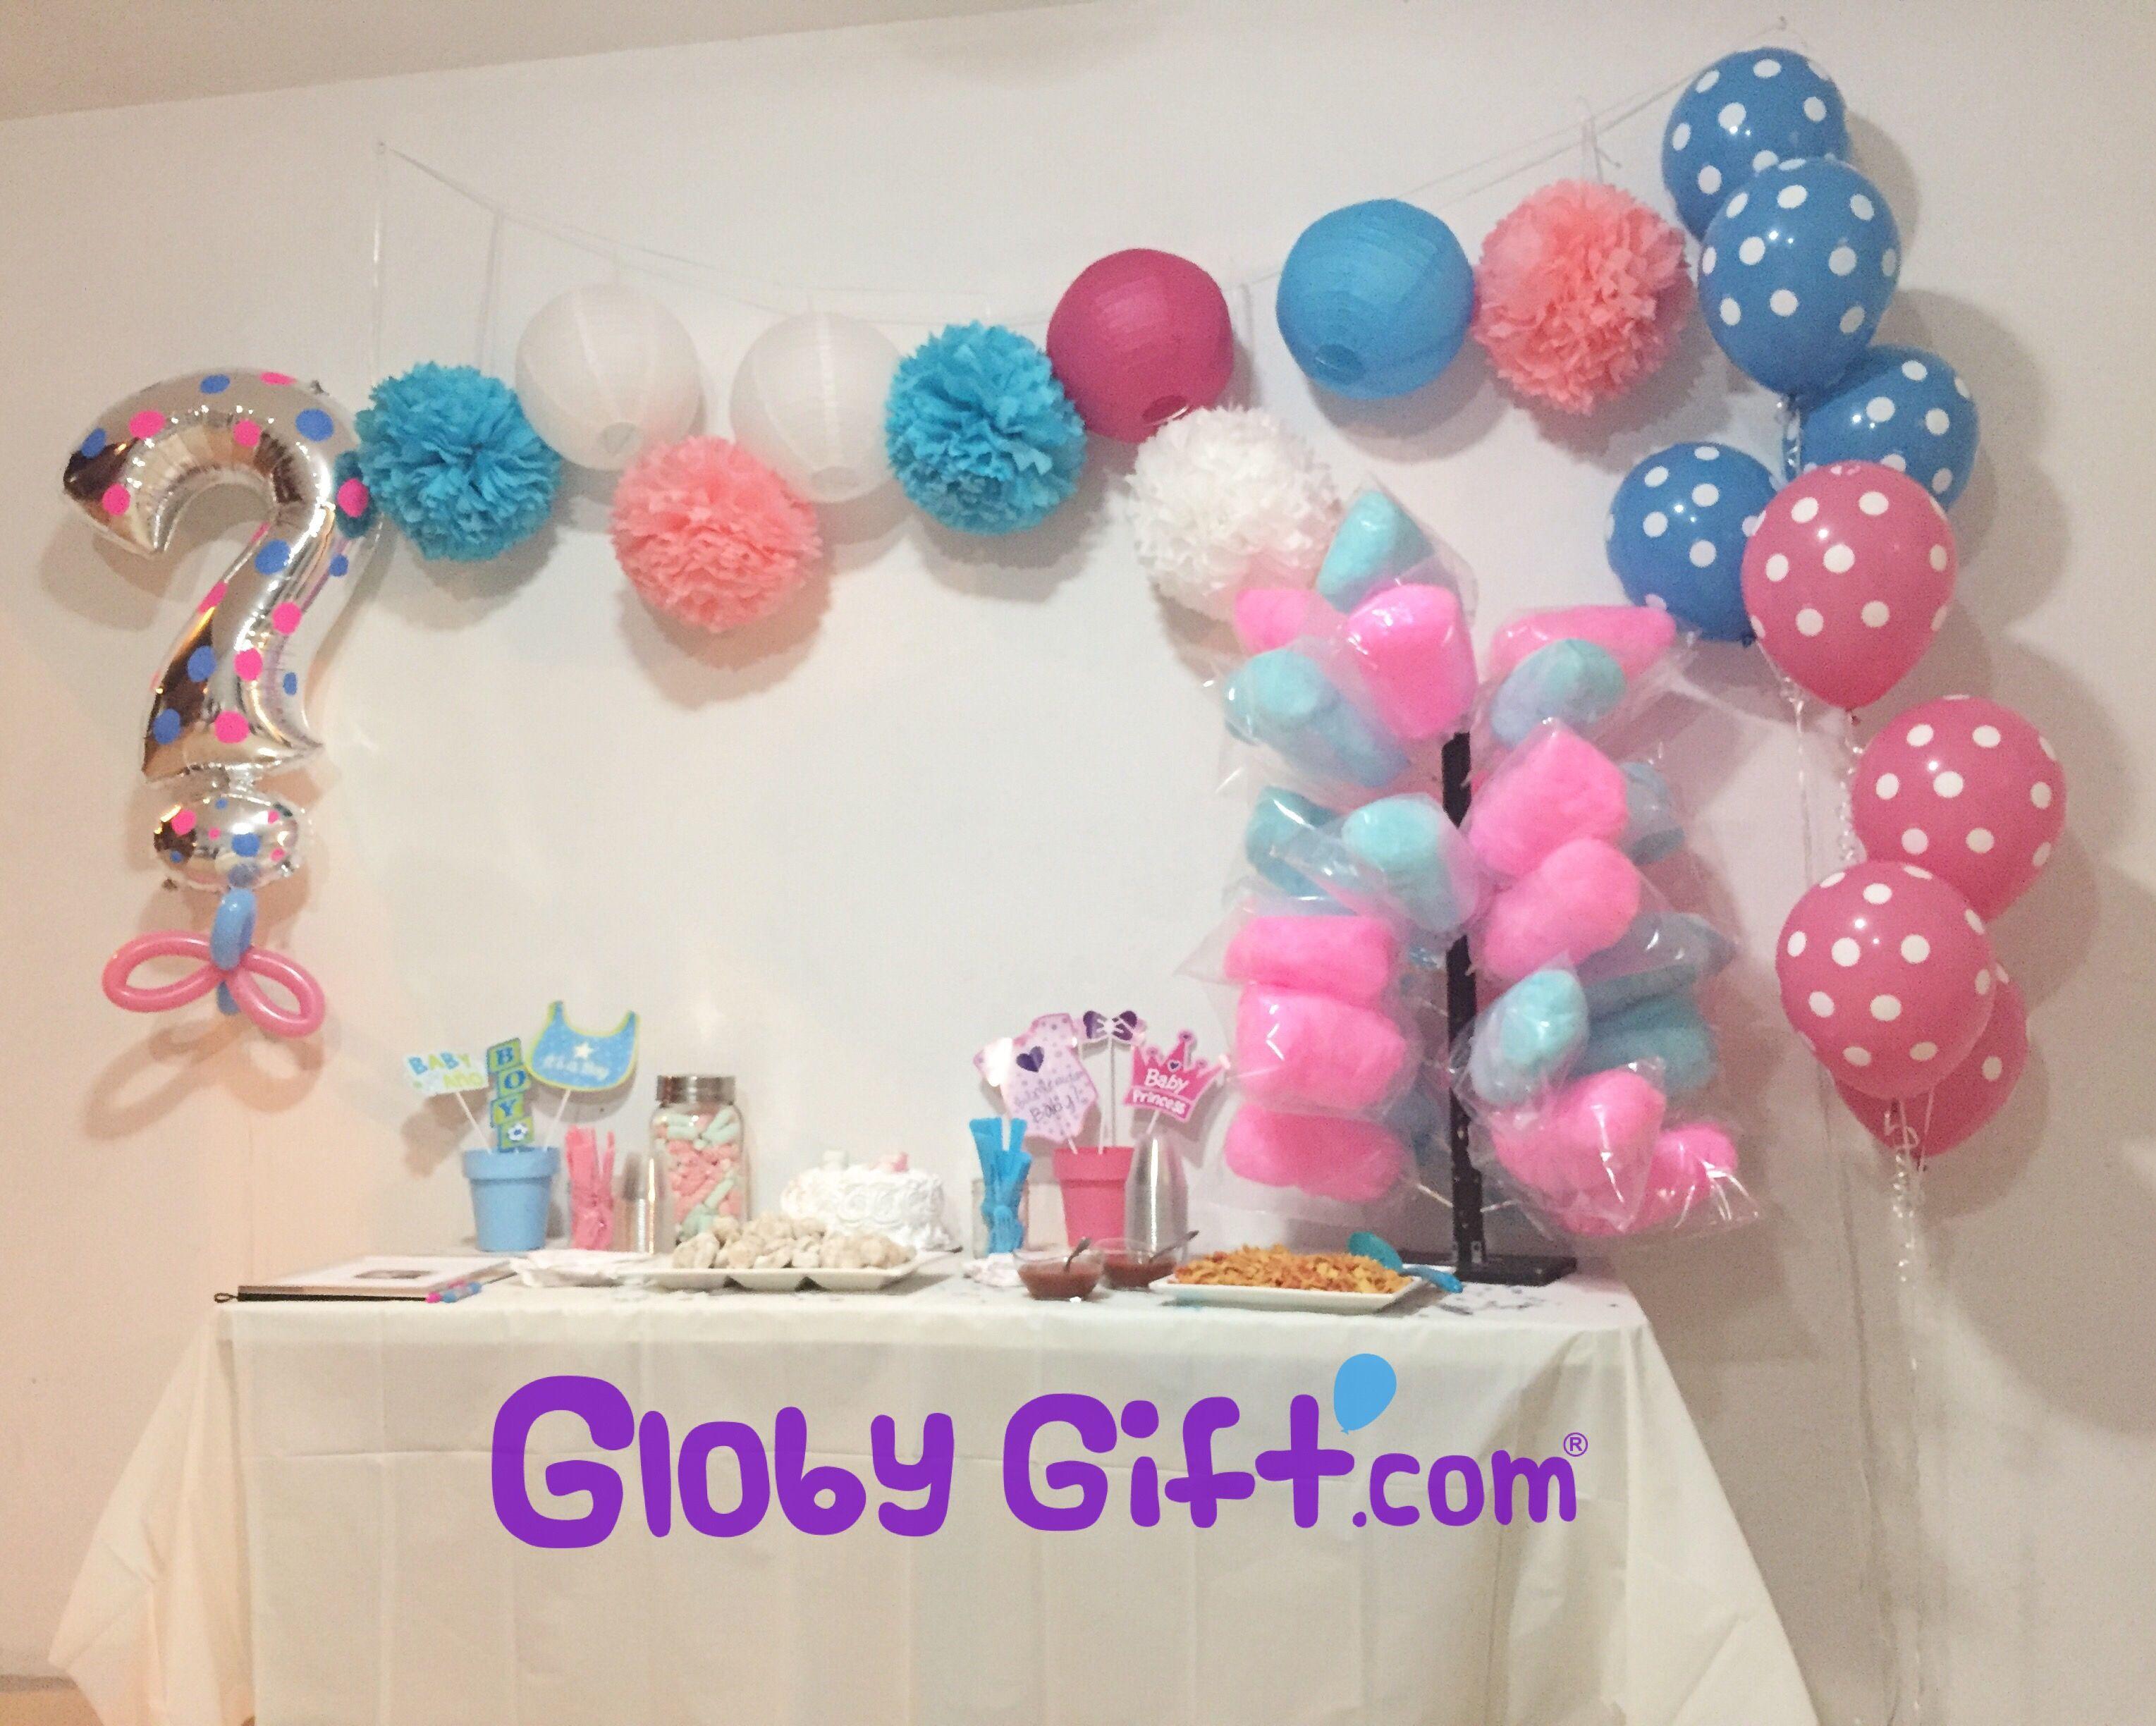 Globos para decorar fiesta de revelacin del sexo del beb Balloon